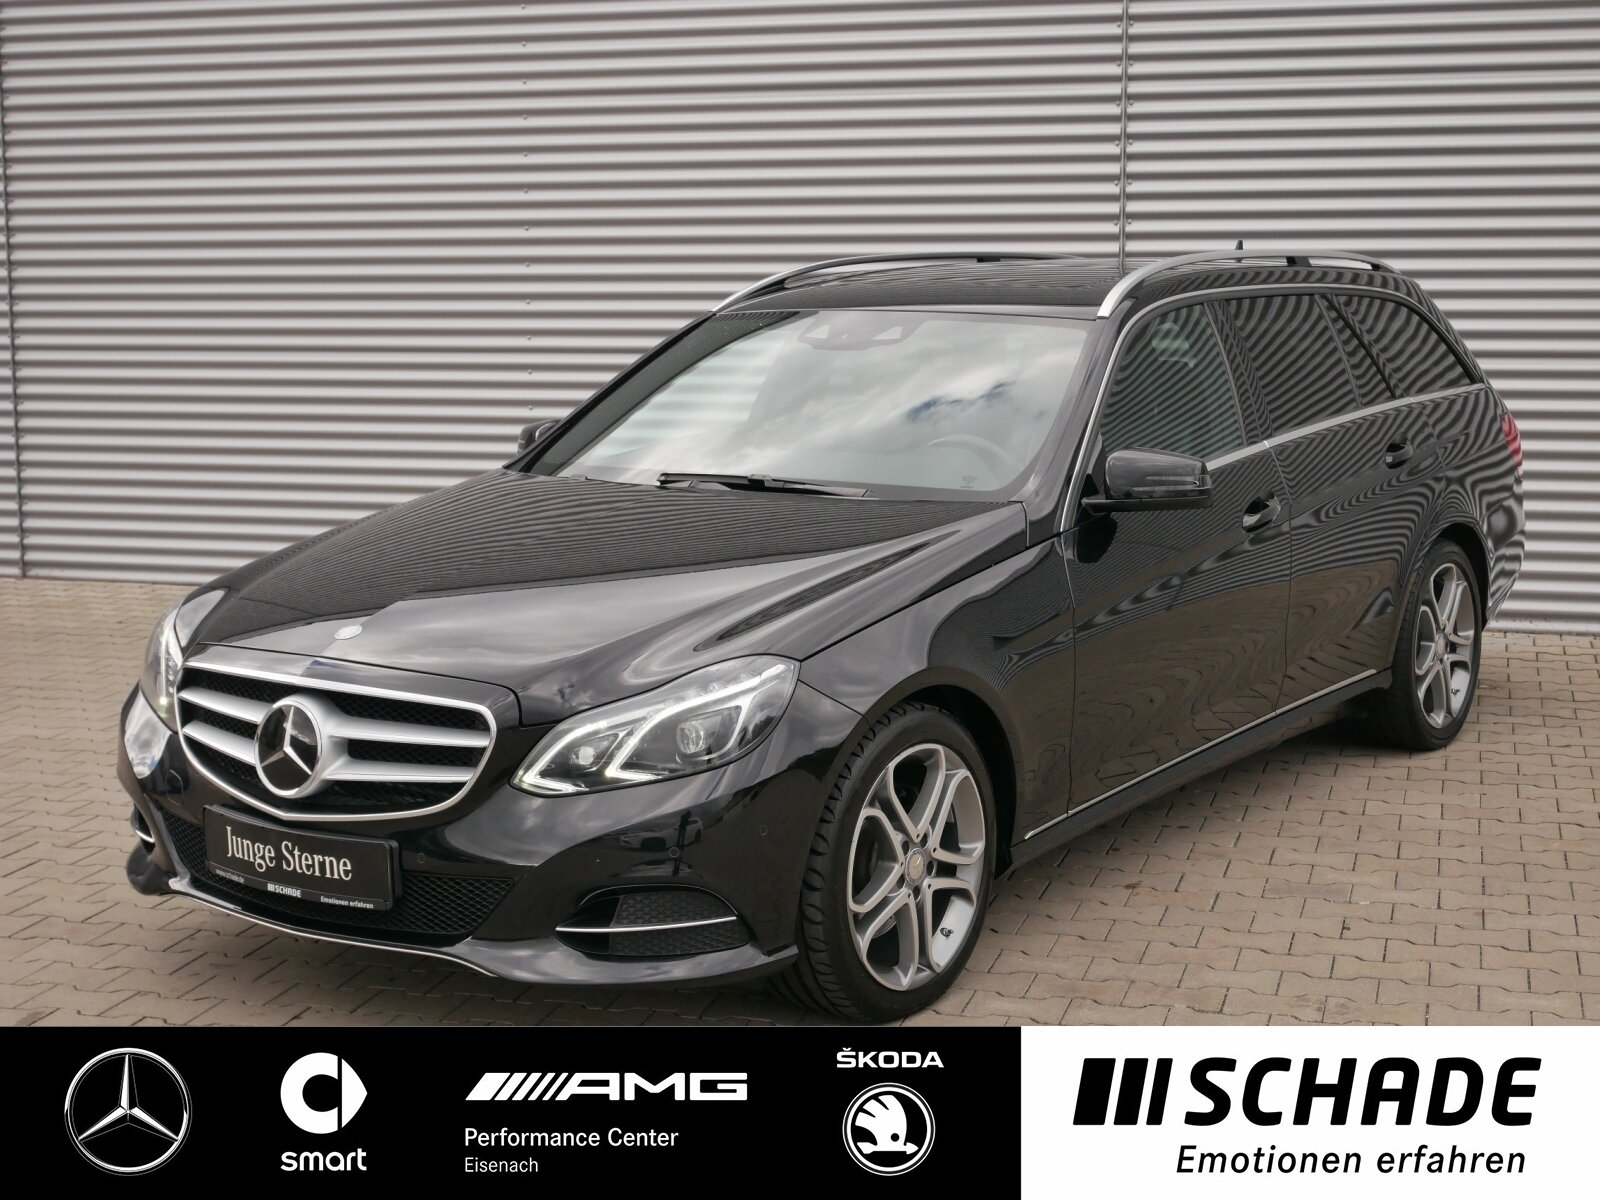 Mercedes-Benz E 300 T BT Elegance Comand*Distronic*Sport Paket, Jahr 2014, Diesel